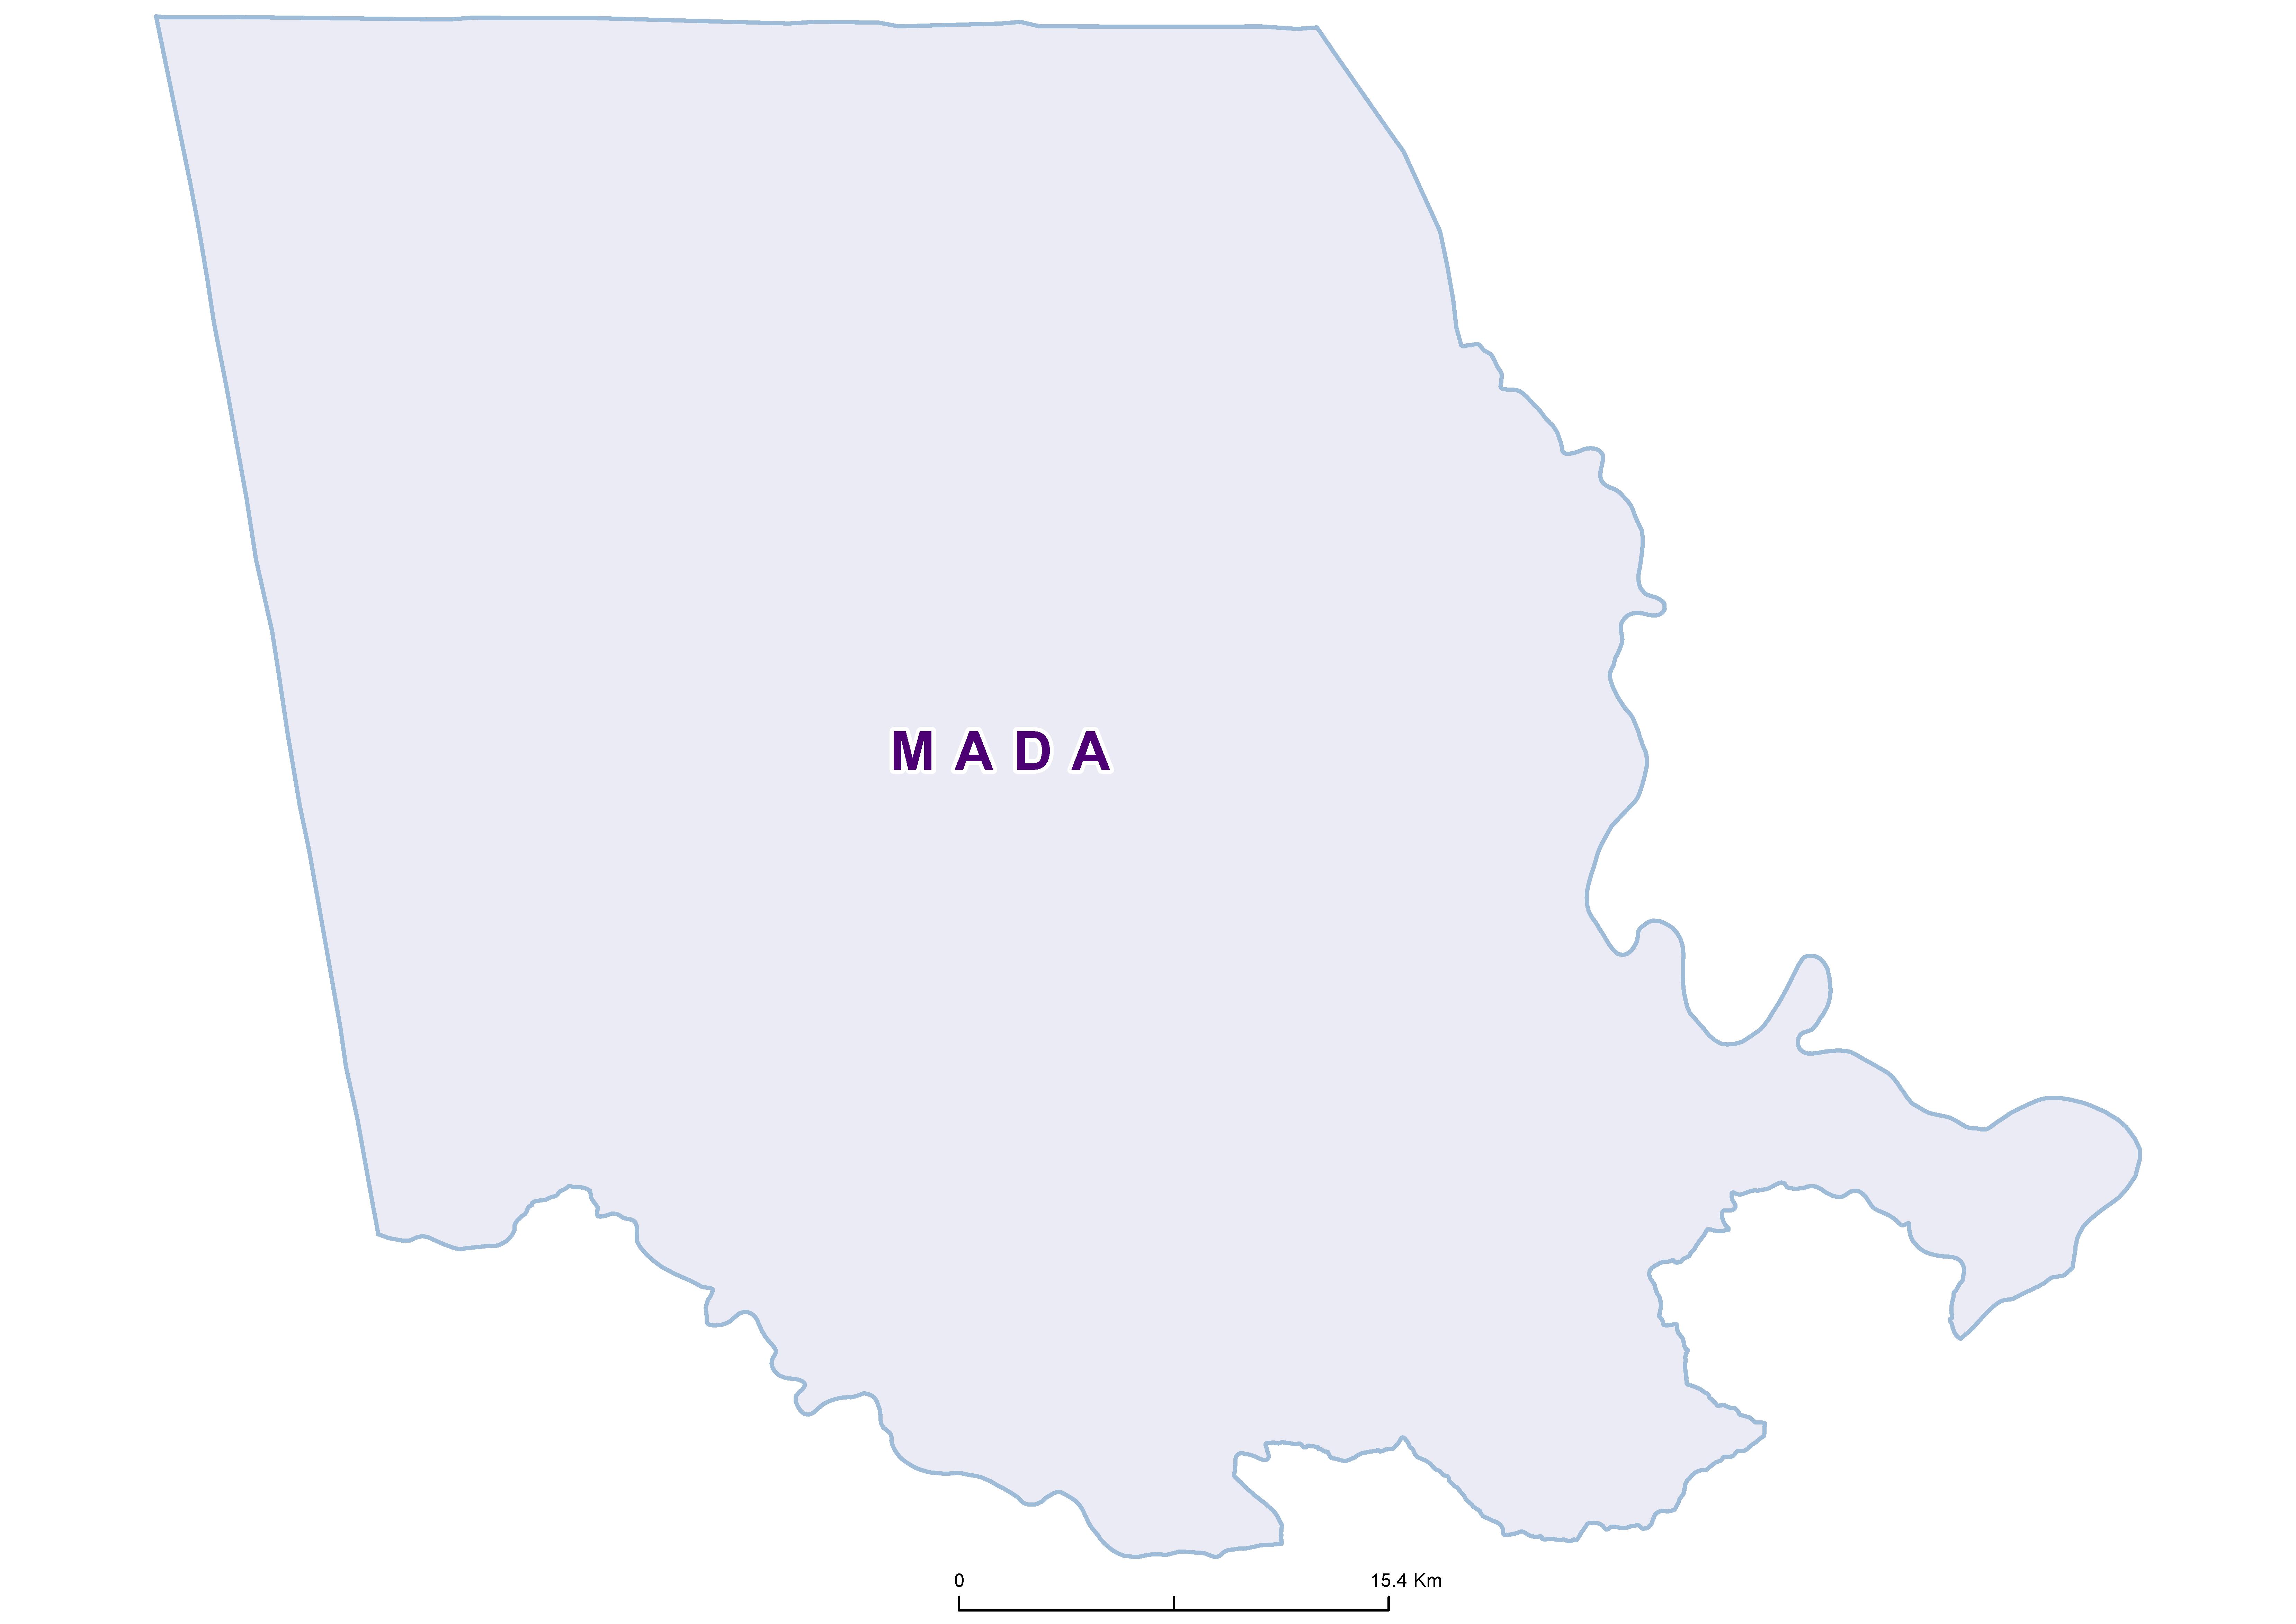 Mada Max STH 20180001